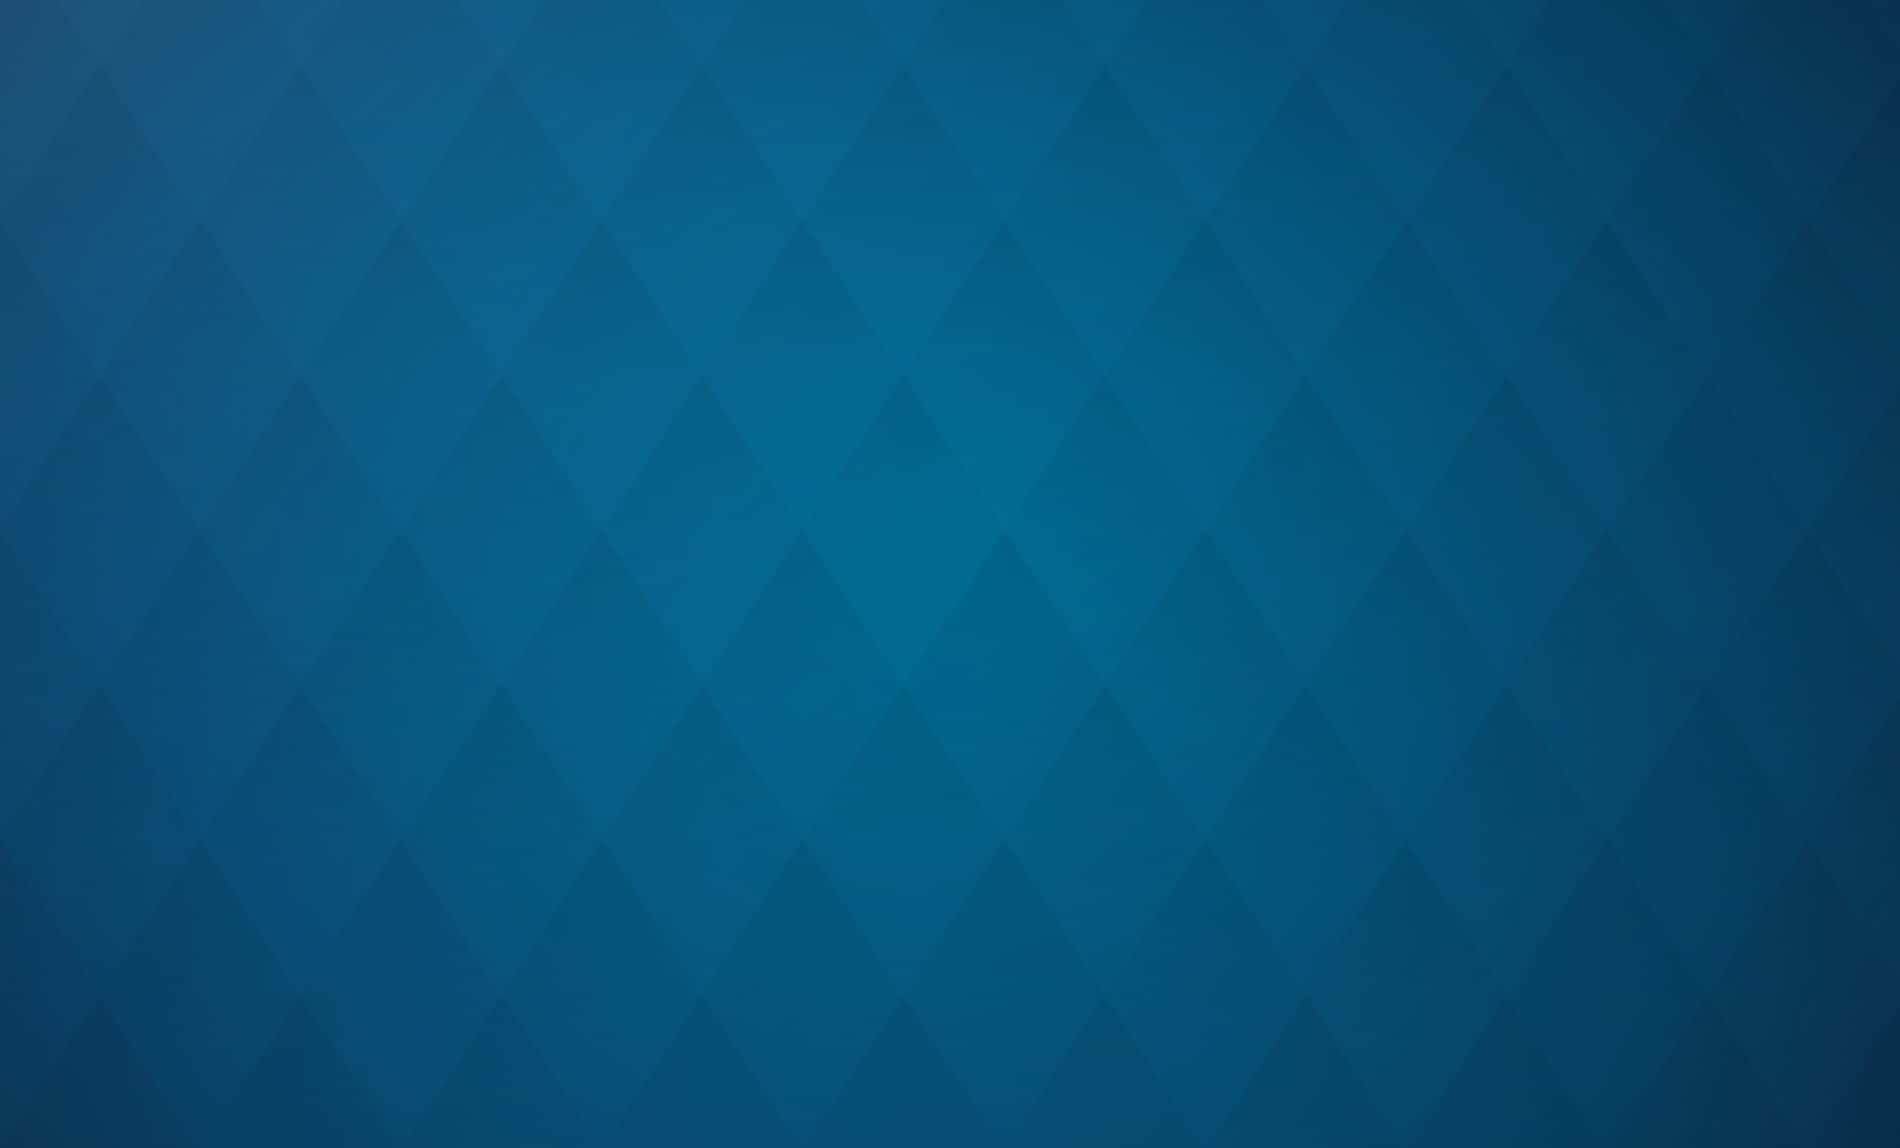 Ecommerce Development Company Slide Background